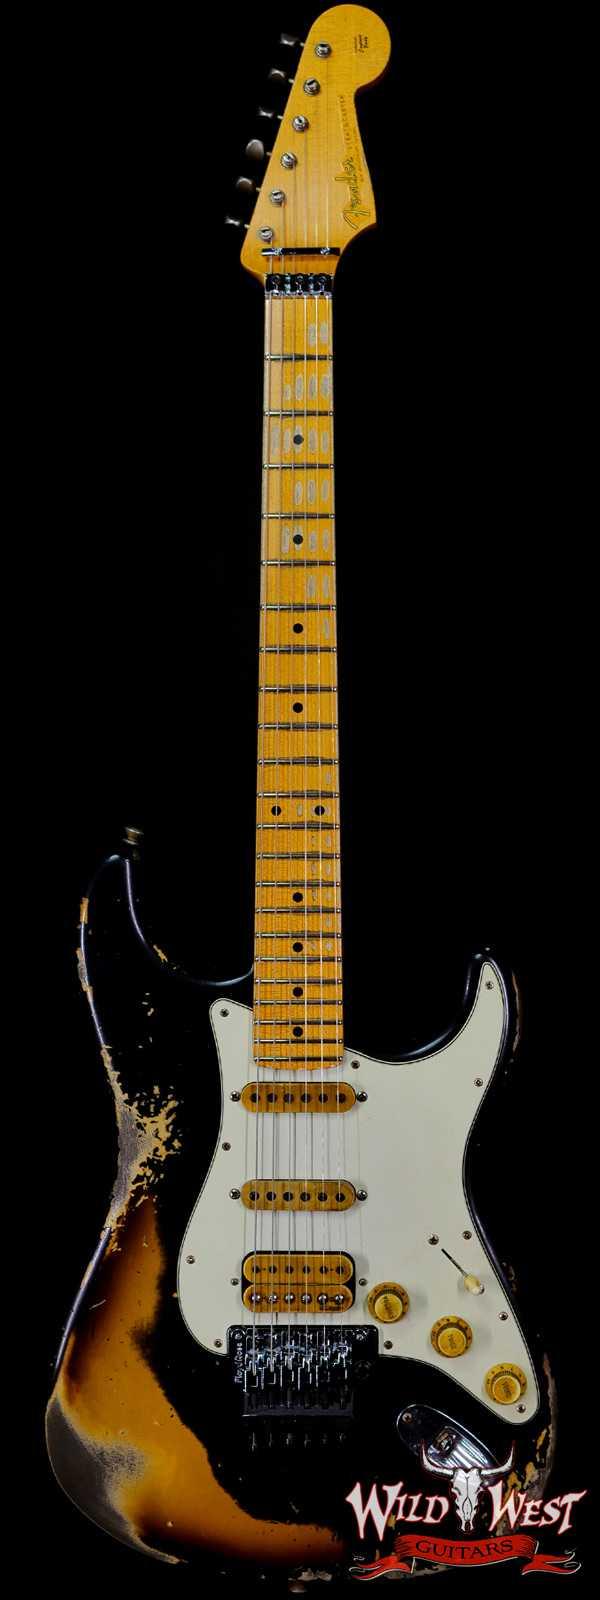 Fender Custom Shop Wild West Black Lightning Stratocaster Floyd Rose Heavy Relic Maple Board 2 Tone Sunburst